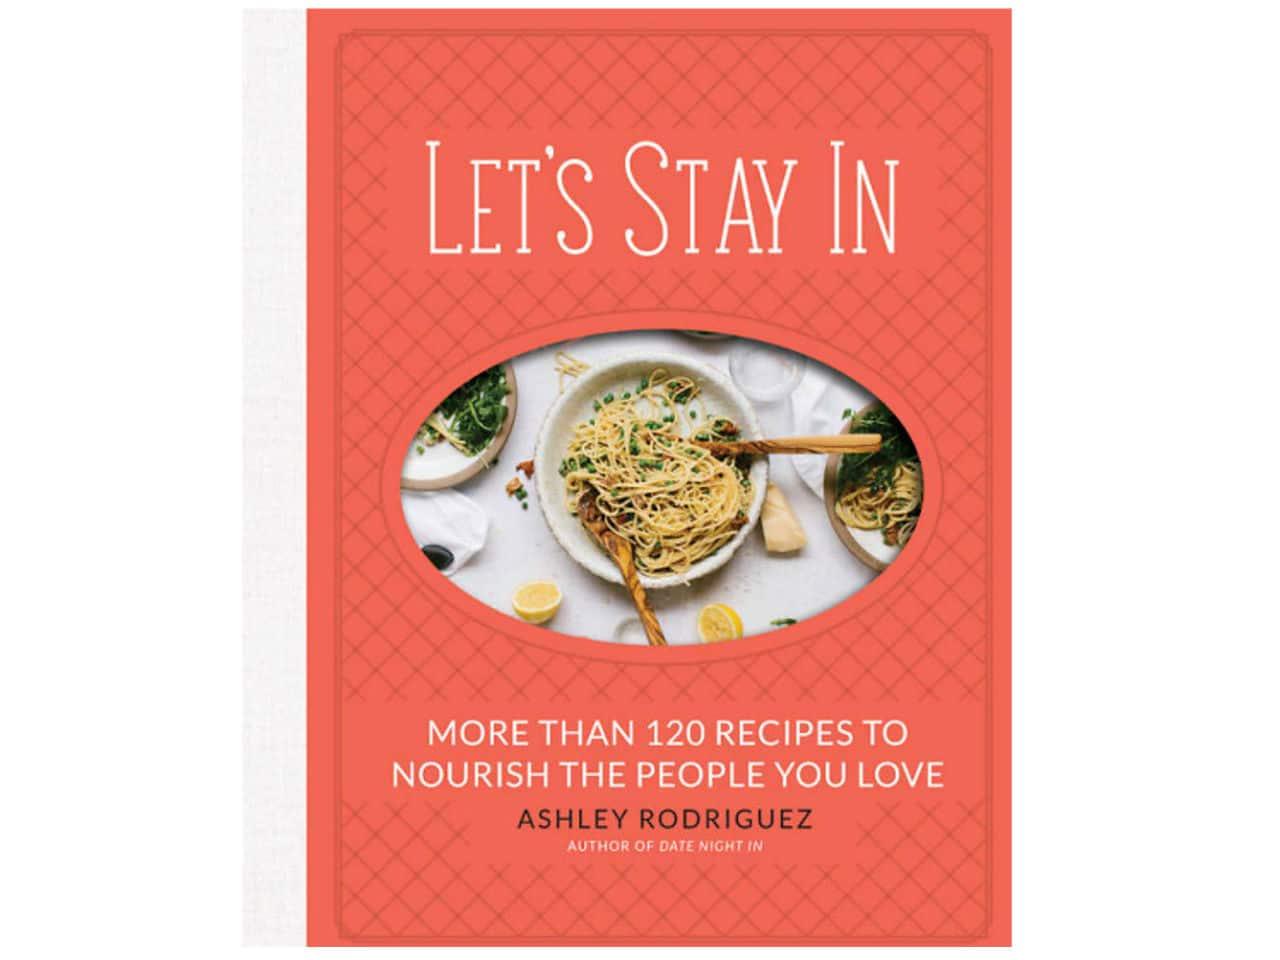 cookbook that says